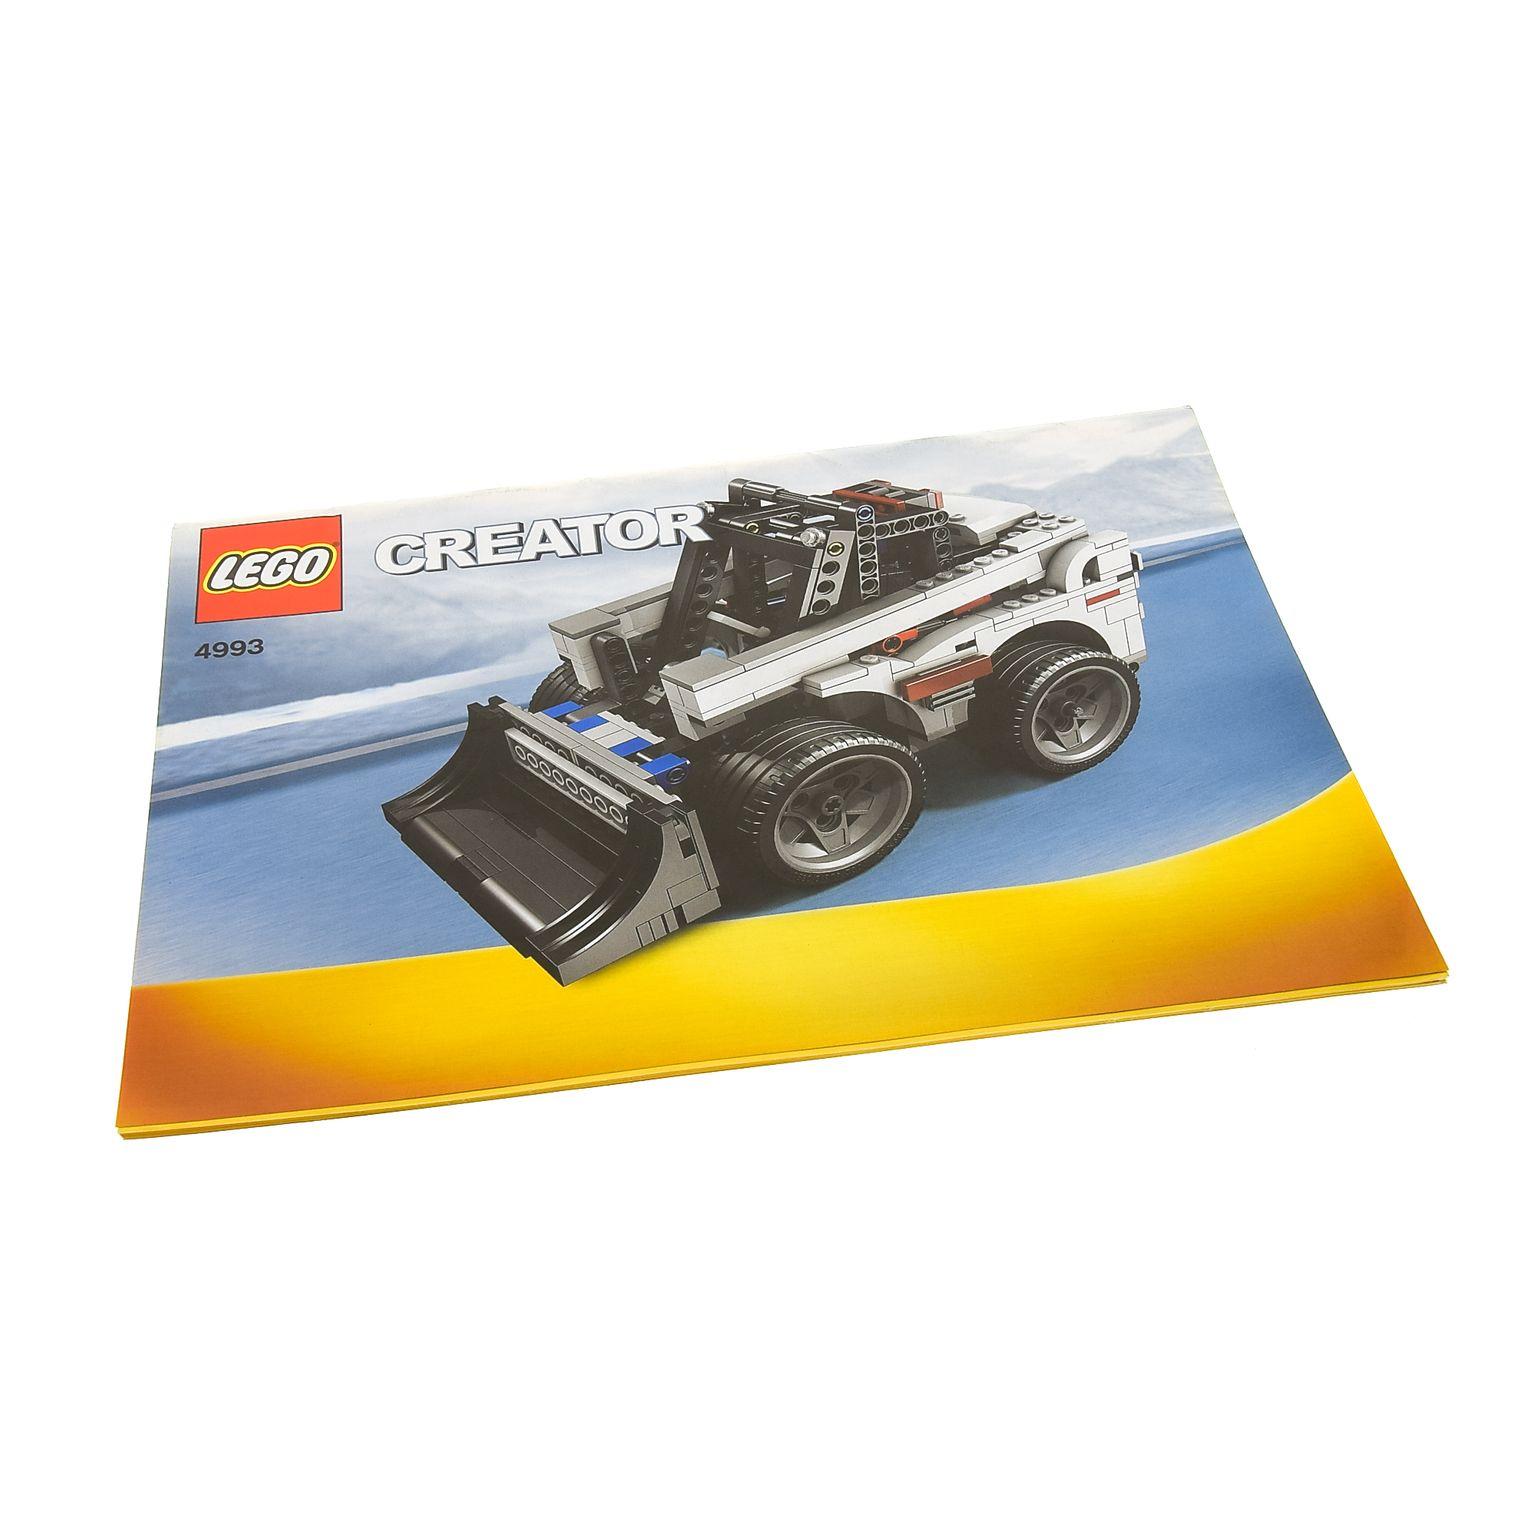 1 X Lego Brick Instructions Creator Model Traffic Cool Convertible